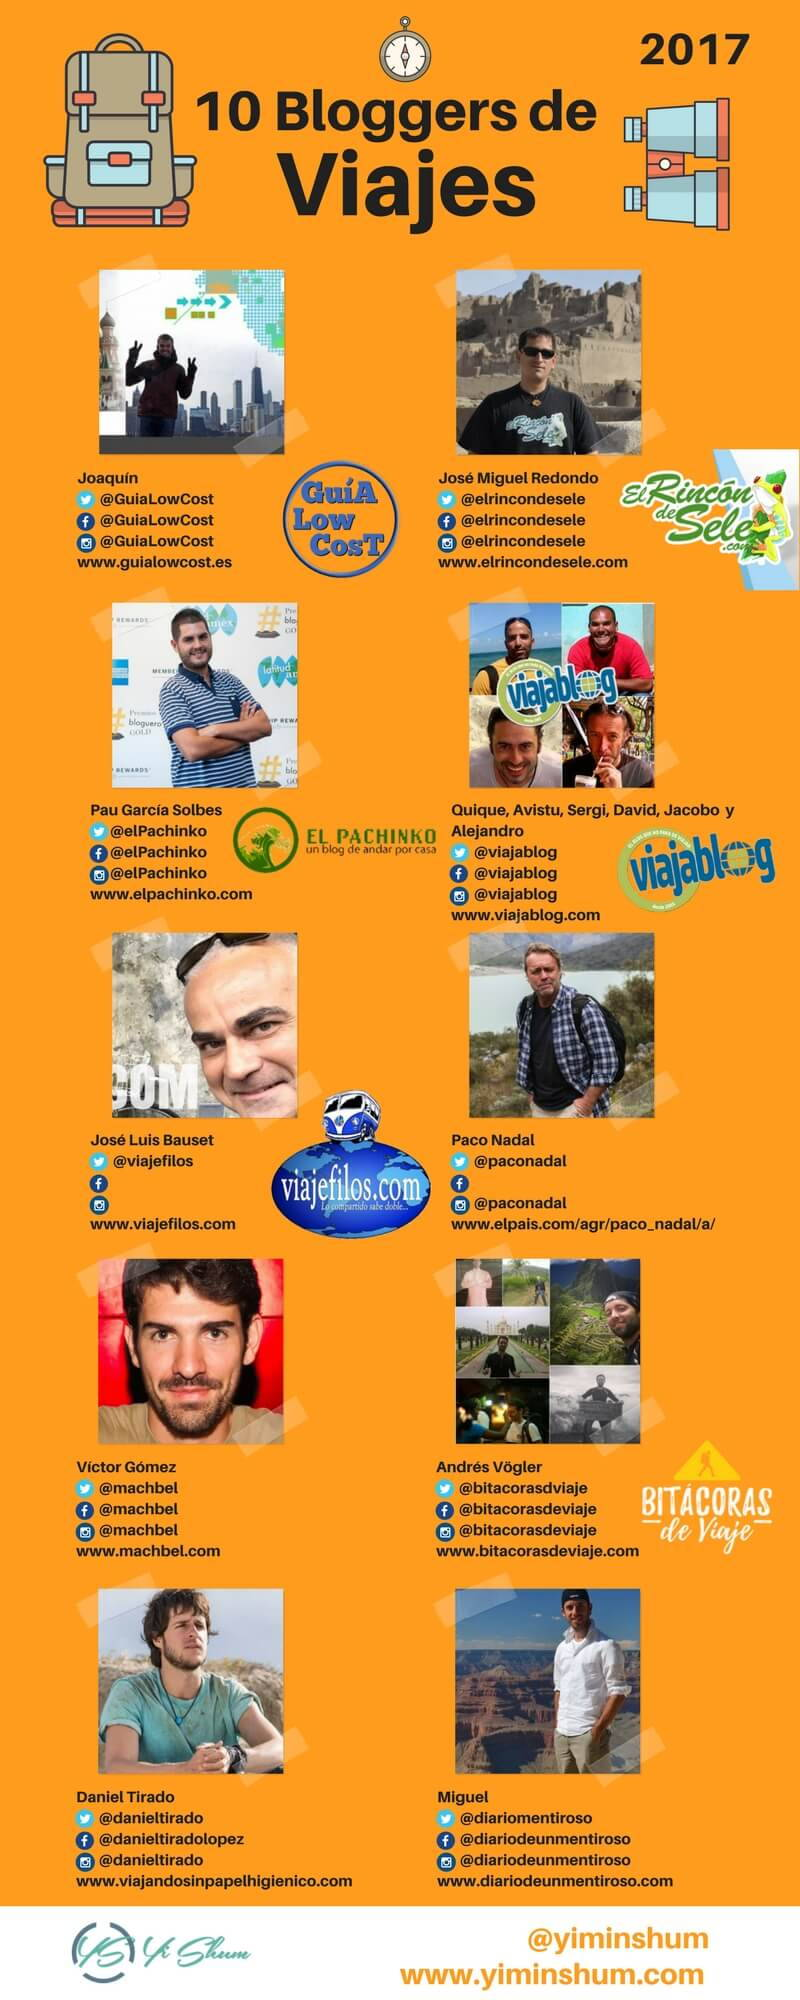 los 10 bloggers de viajes mas influyentes 2017 imagen